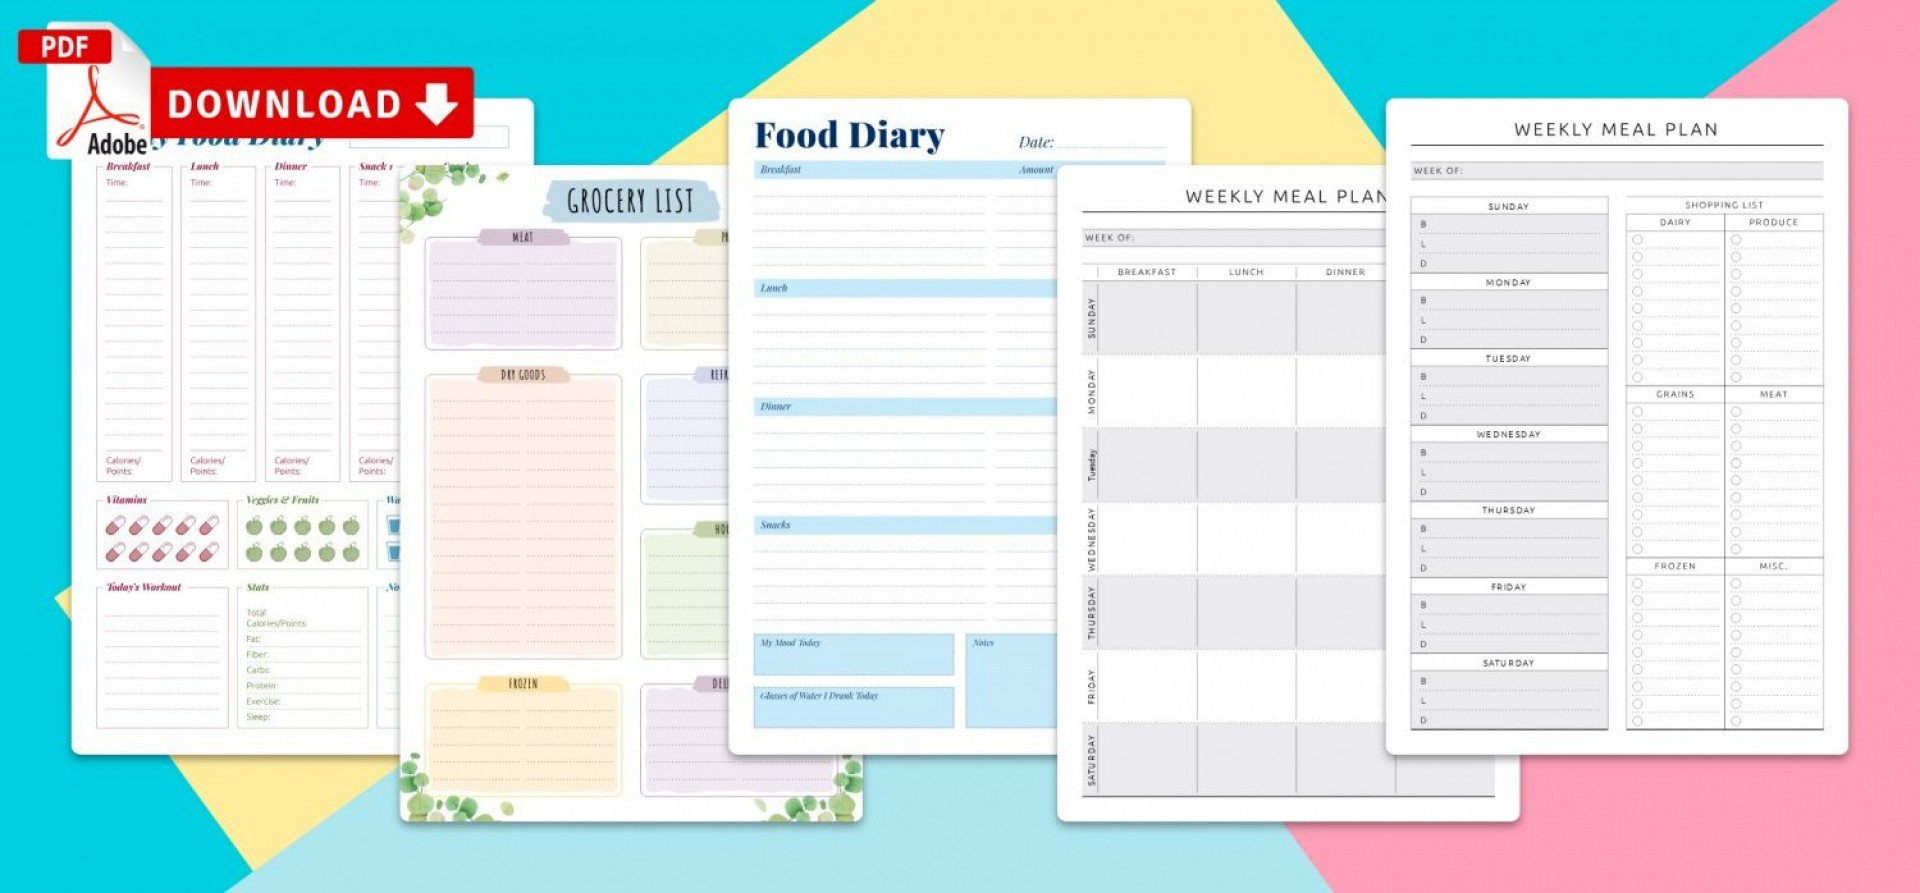 012 Top Meal Plan Calendar Template Sample  Excel Weekly 30 Day1920